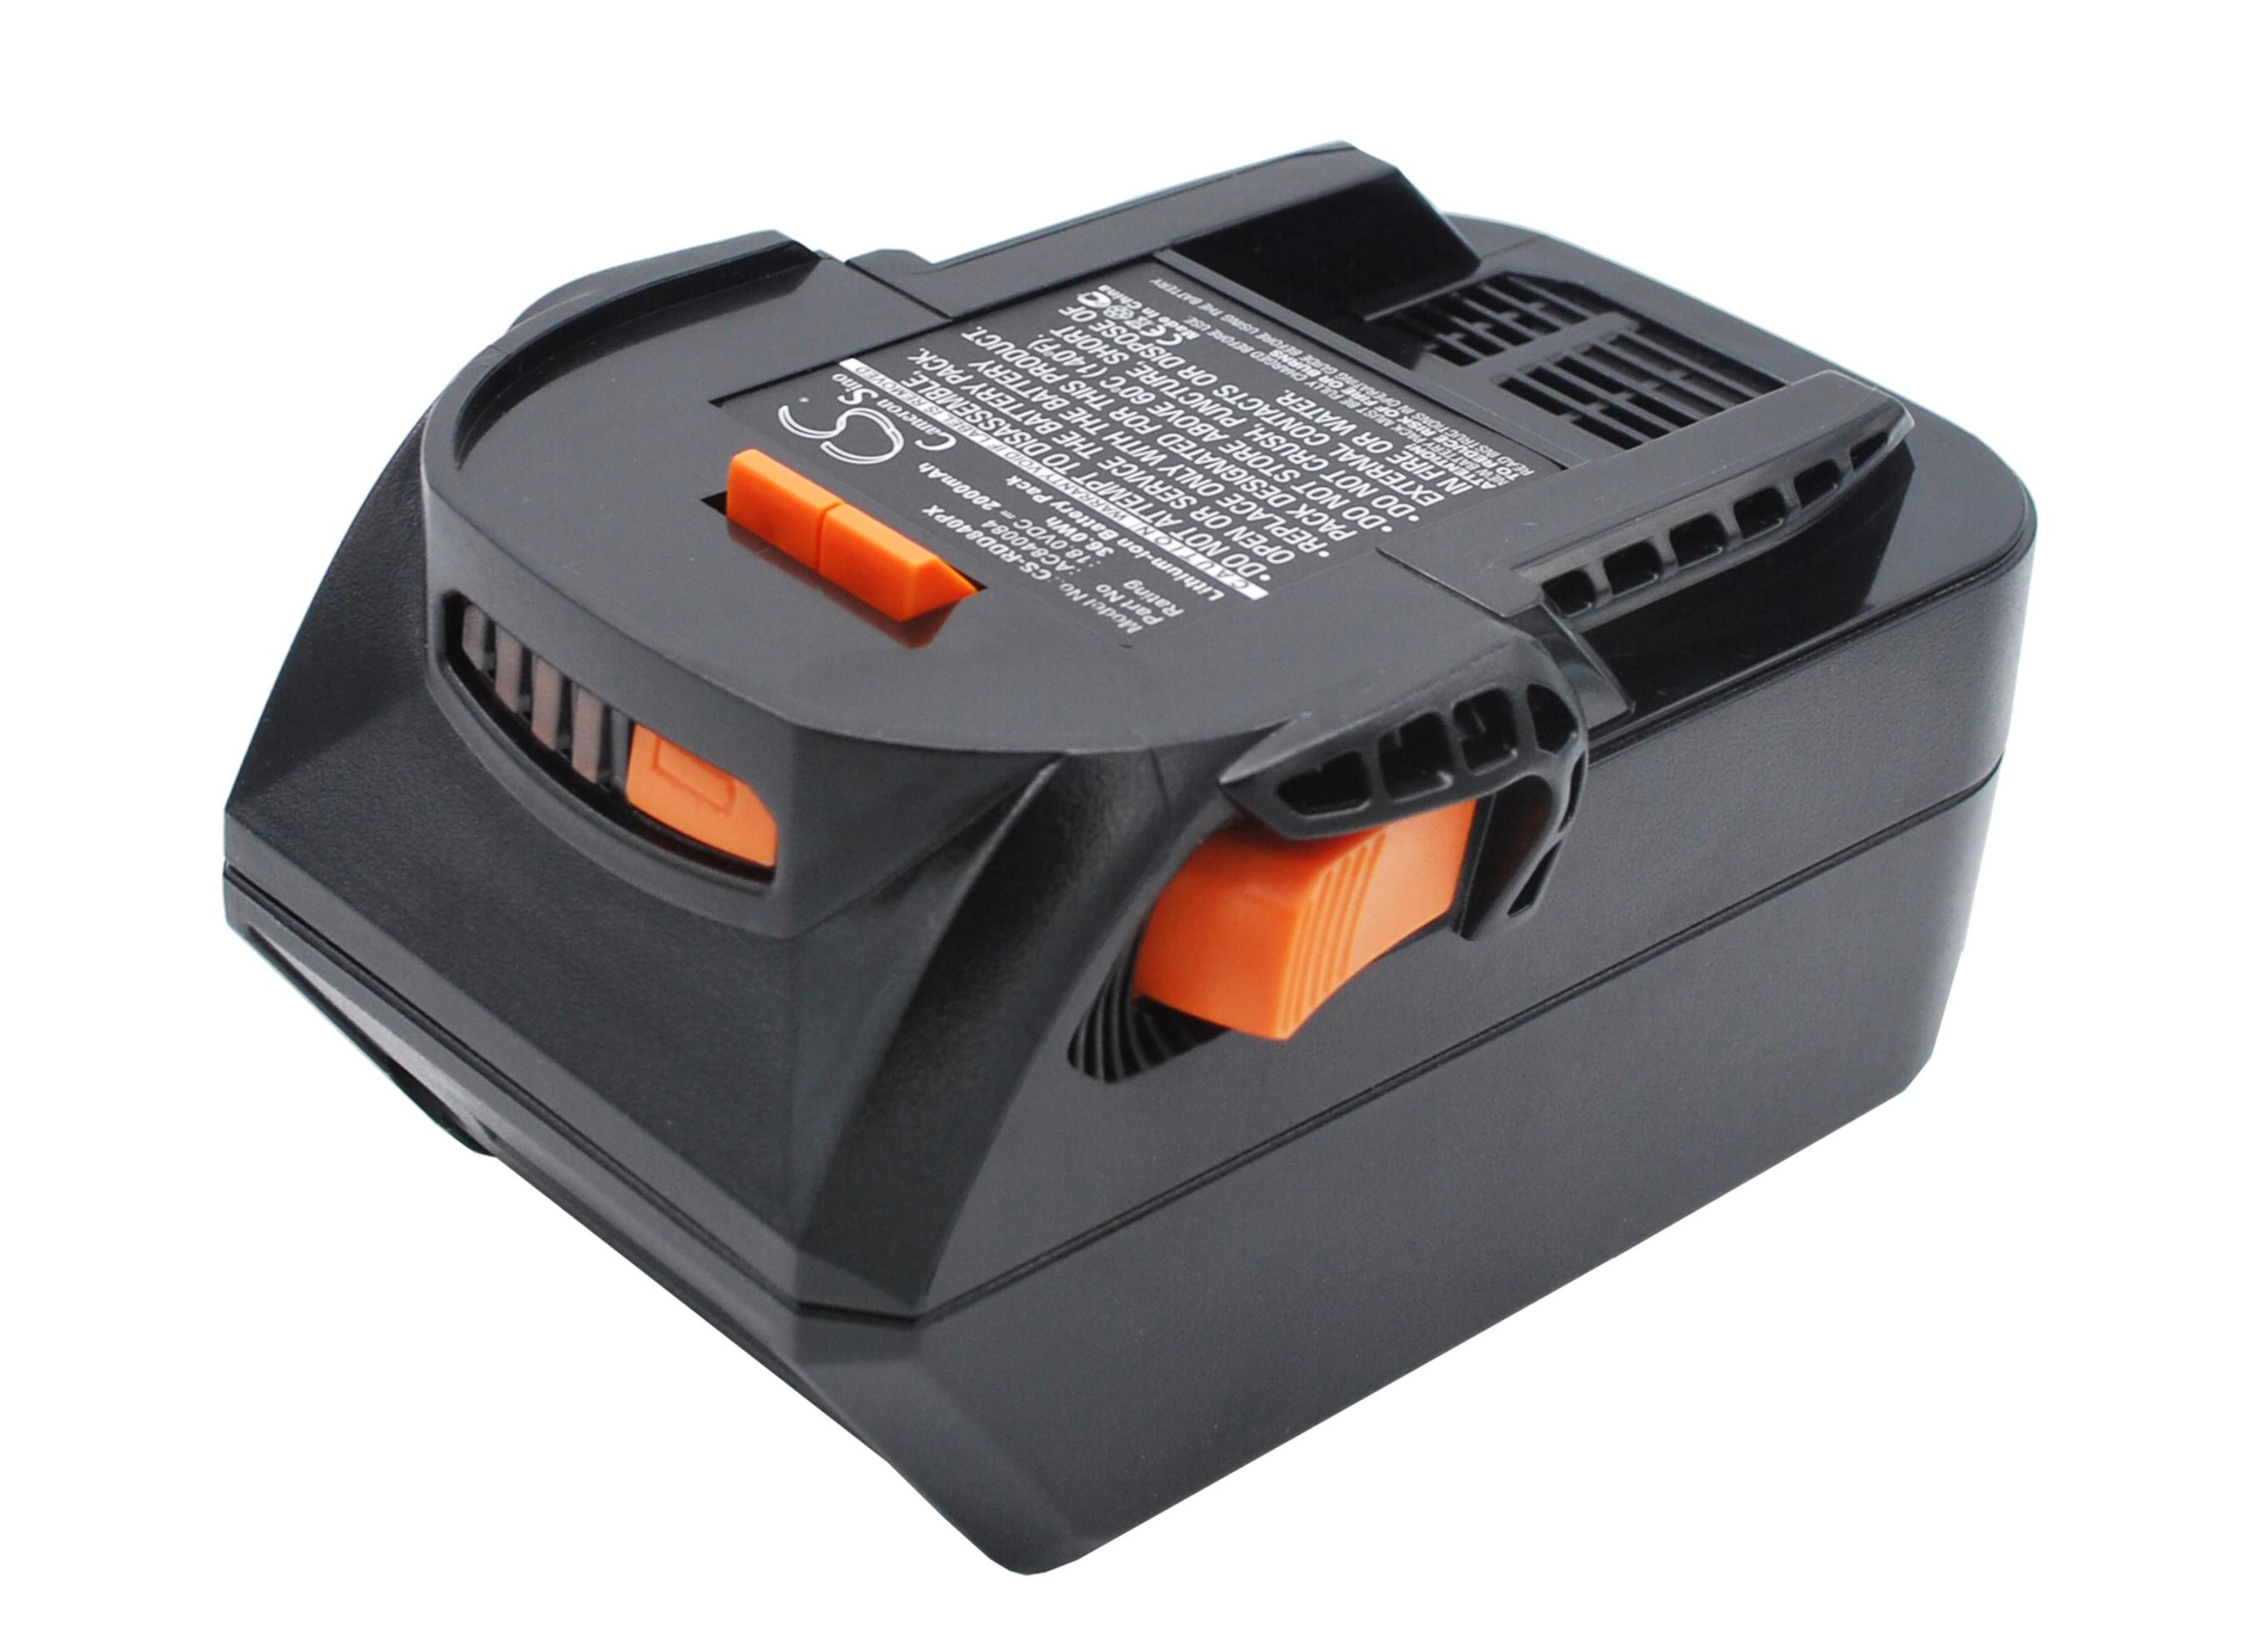 Cameron Sino baterie do nářadí pro AEG BS 18C 18V Li-ion 2000mAh černá - neoriginální